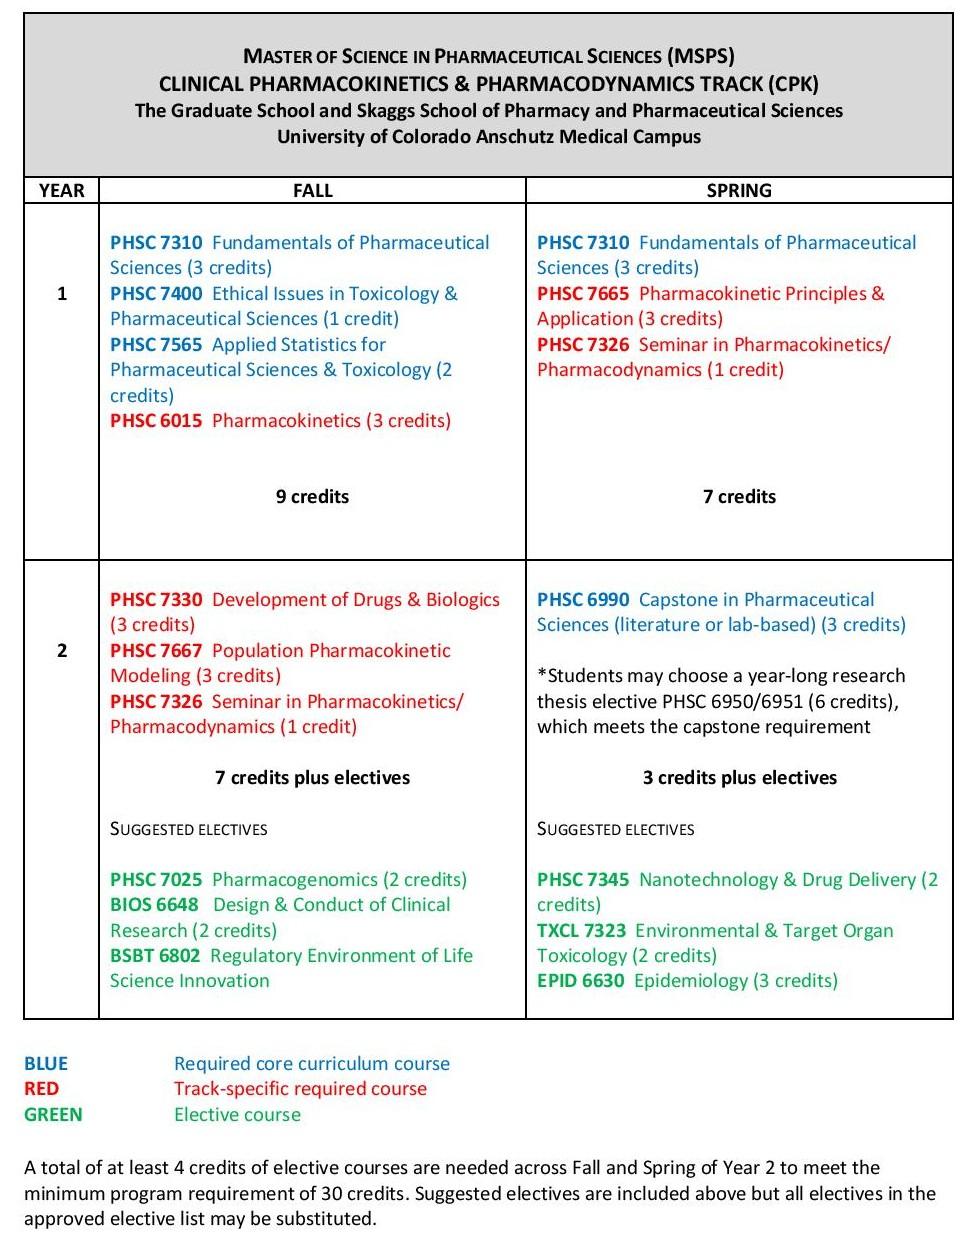 Cu Denver Academic Calendar Fall 2022.Ms In Pharmaceutical Sciences Cu School Of Pharmacy